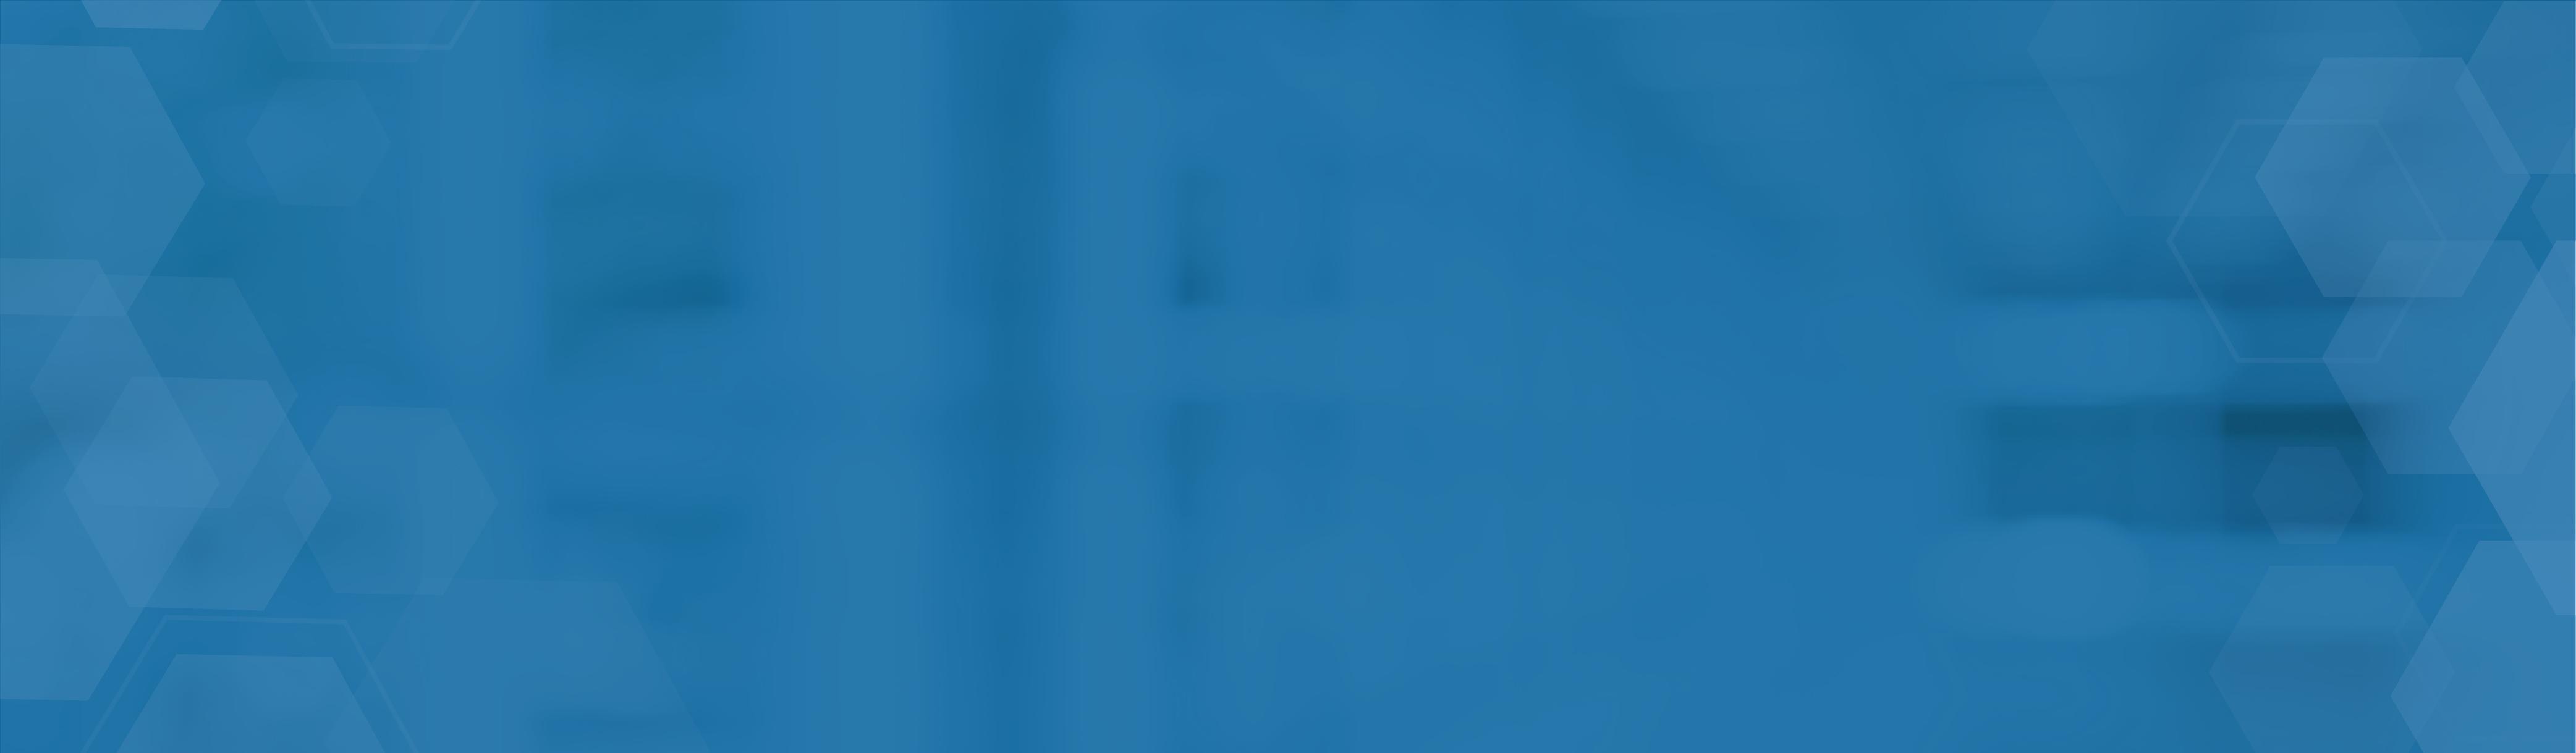 COVID19 web banner